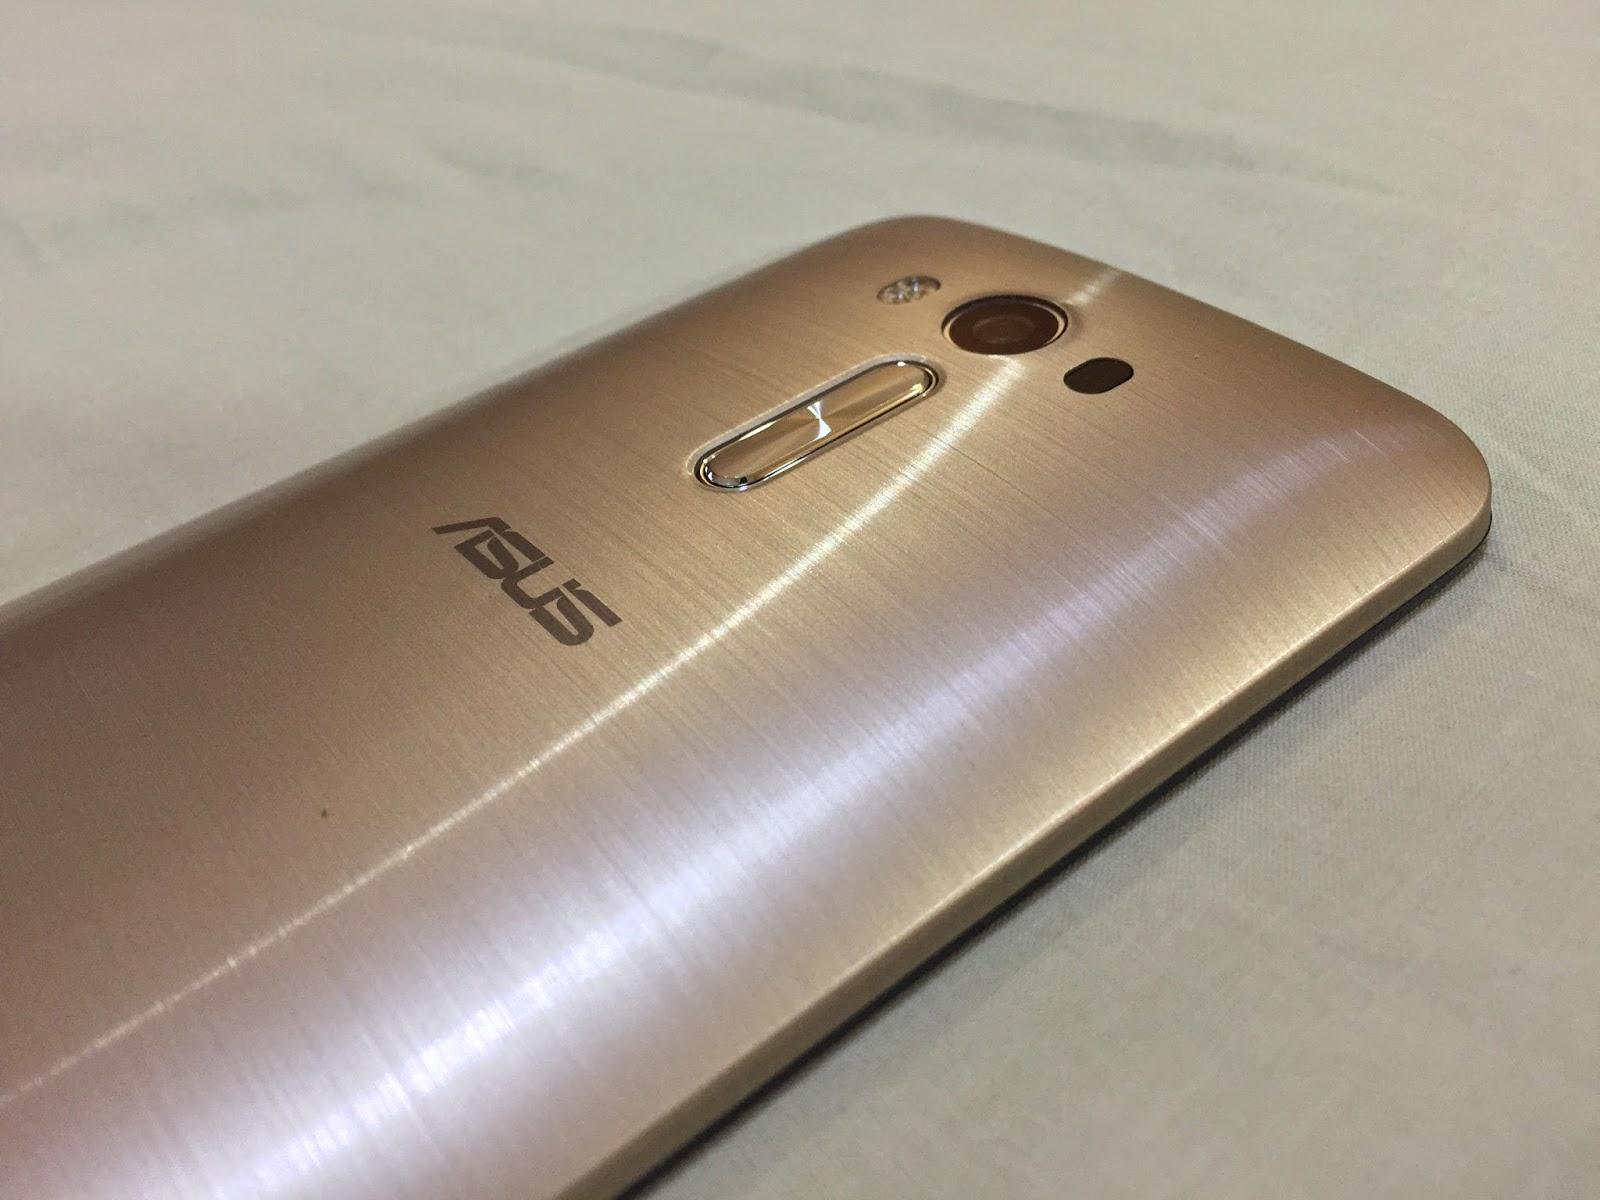 Asus Zenfone 2 Laser Ze550kl Camera Review Sample Stills Videos Ze 550kl